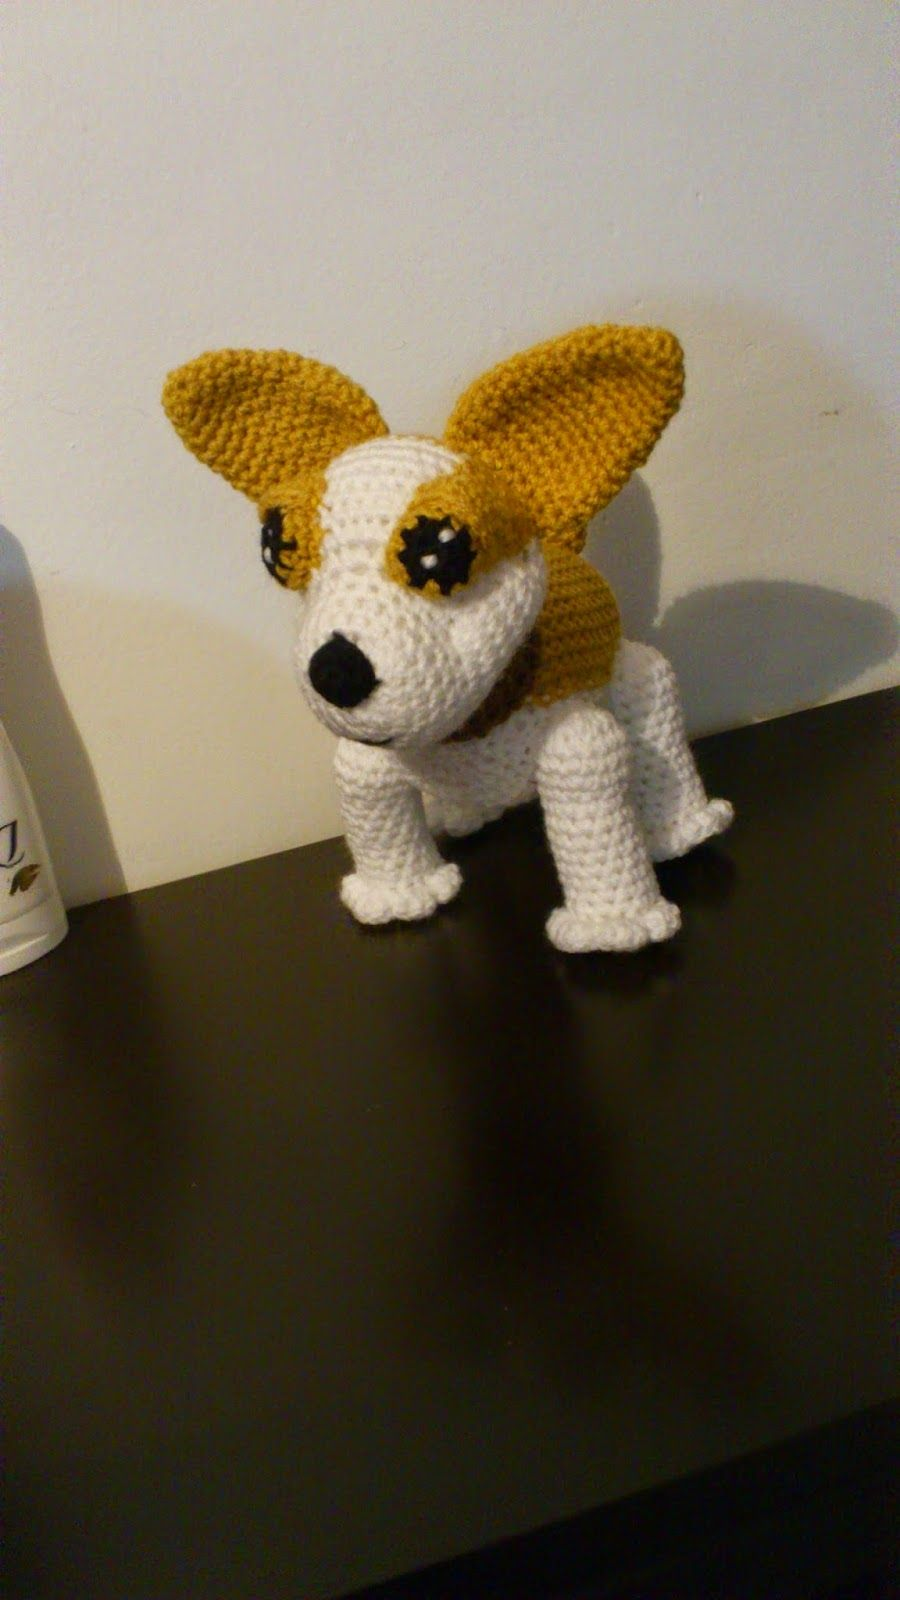 Amigurumi Chihuahua - FREE Crochet Pattern / Tutorial | Amigurumi ...